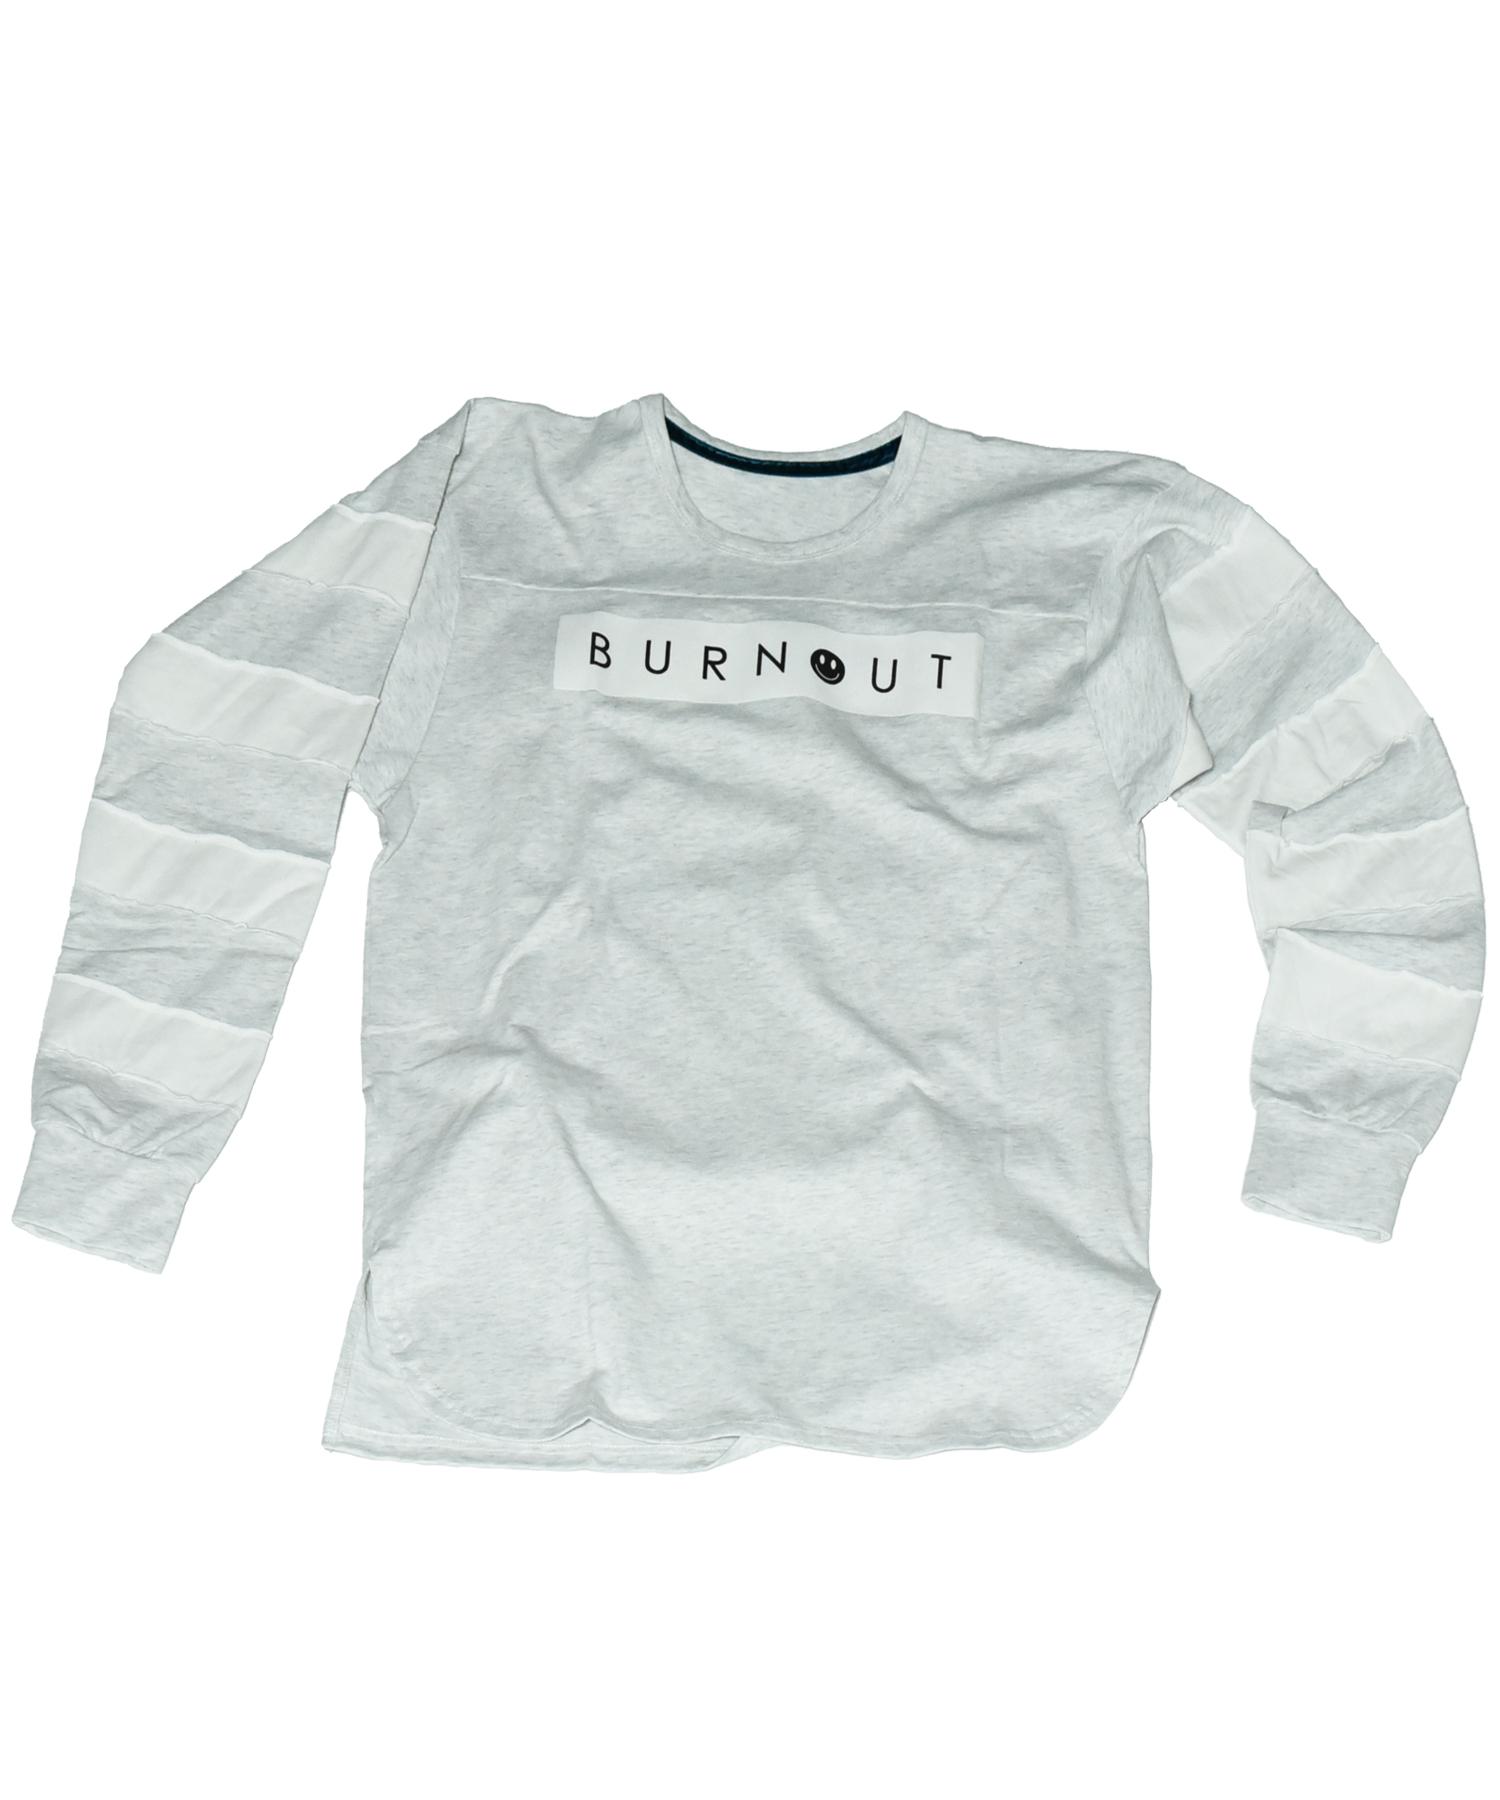 BURNOUT フットボール LT03